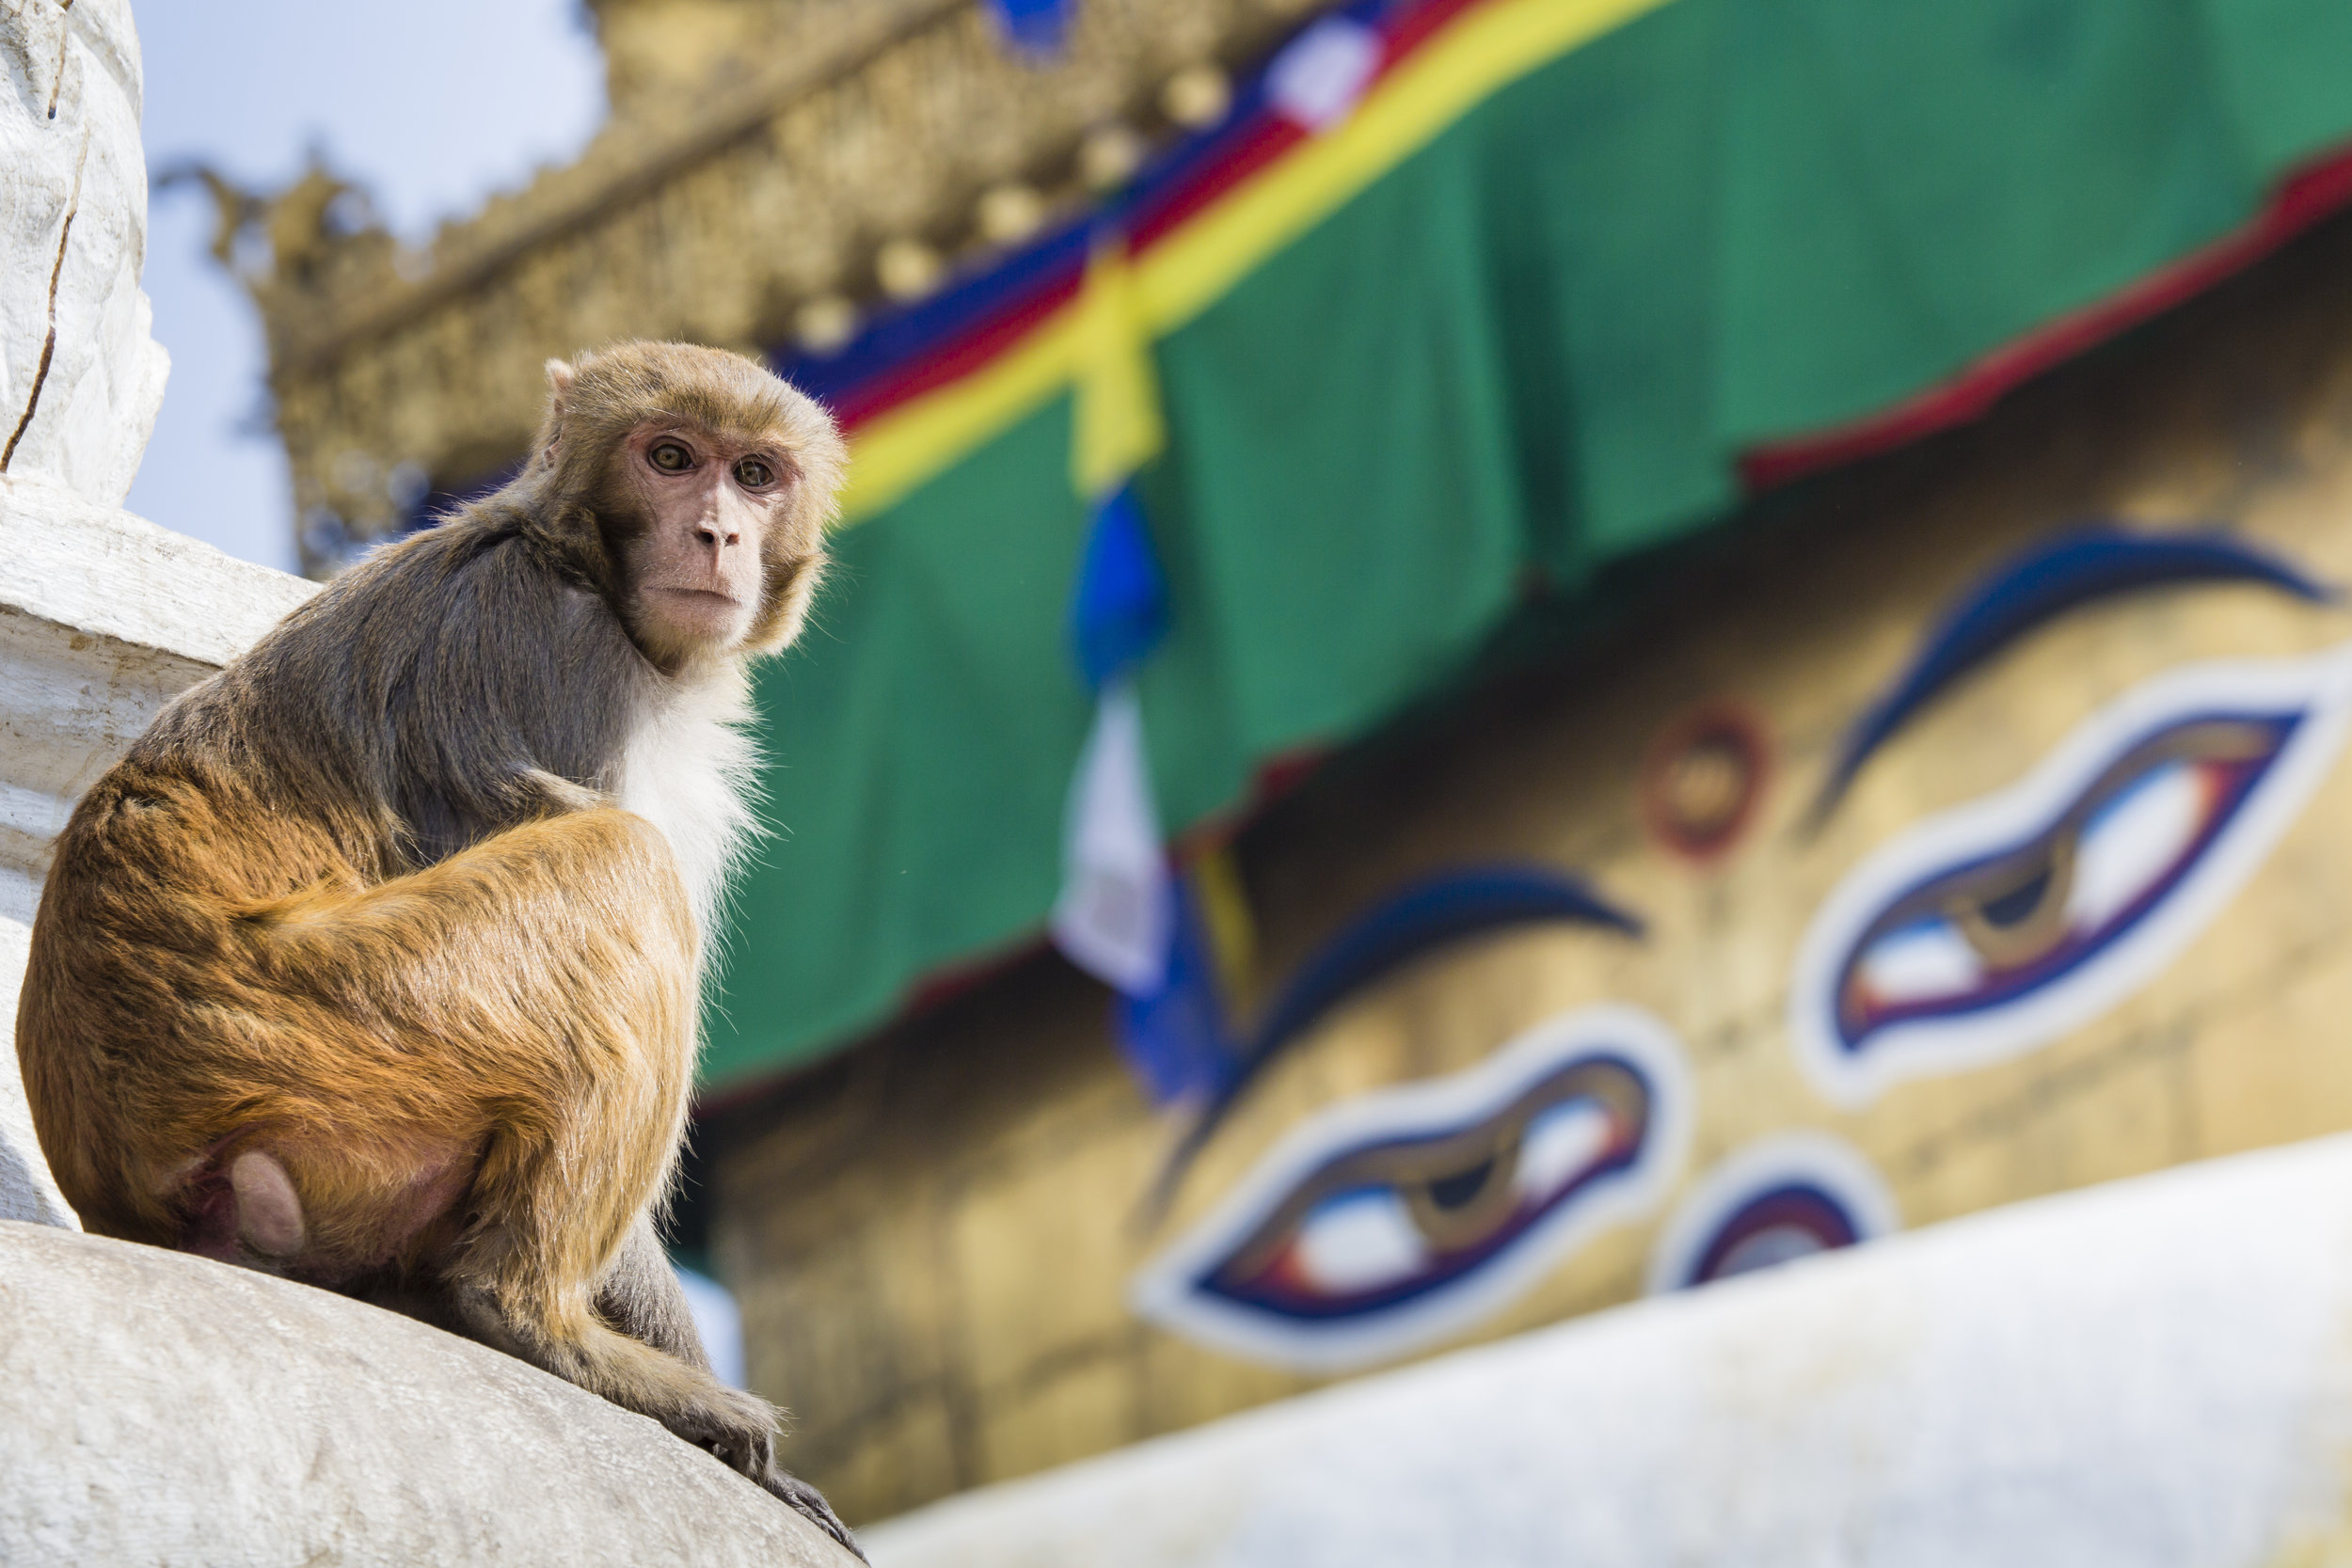 nepal_bigstock-Stupa-In-Swayambhunath-Monkey--85961777.jpg